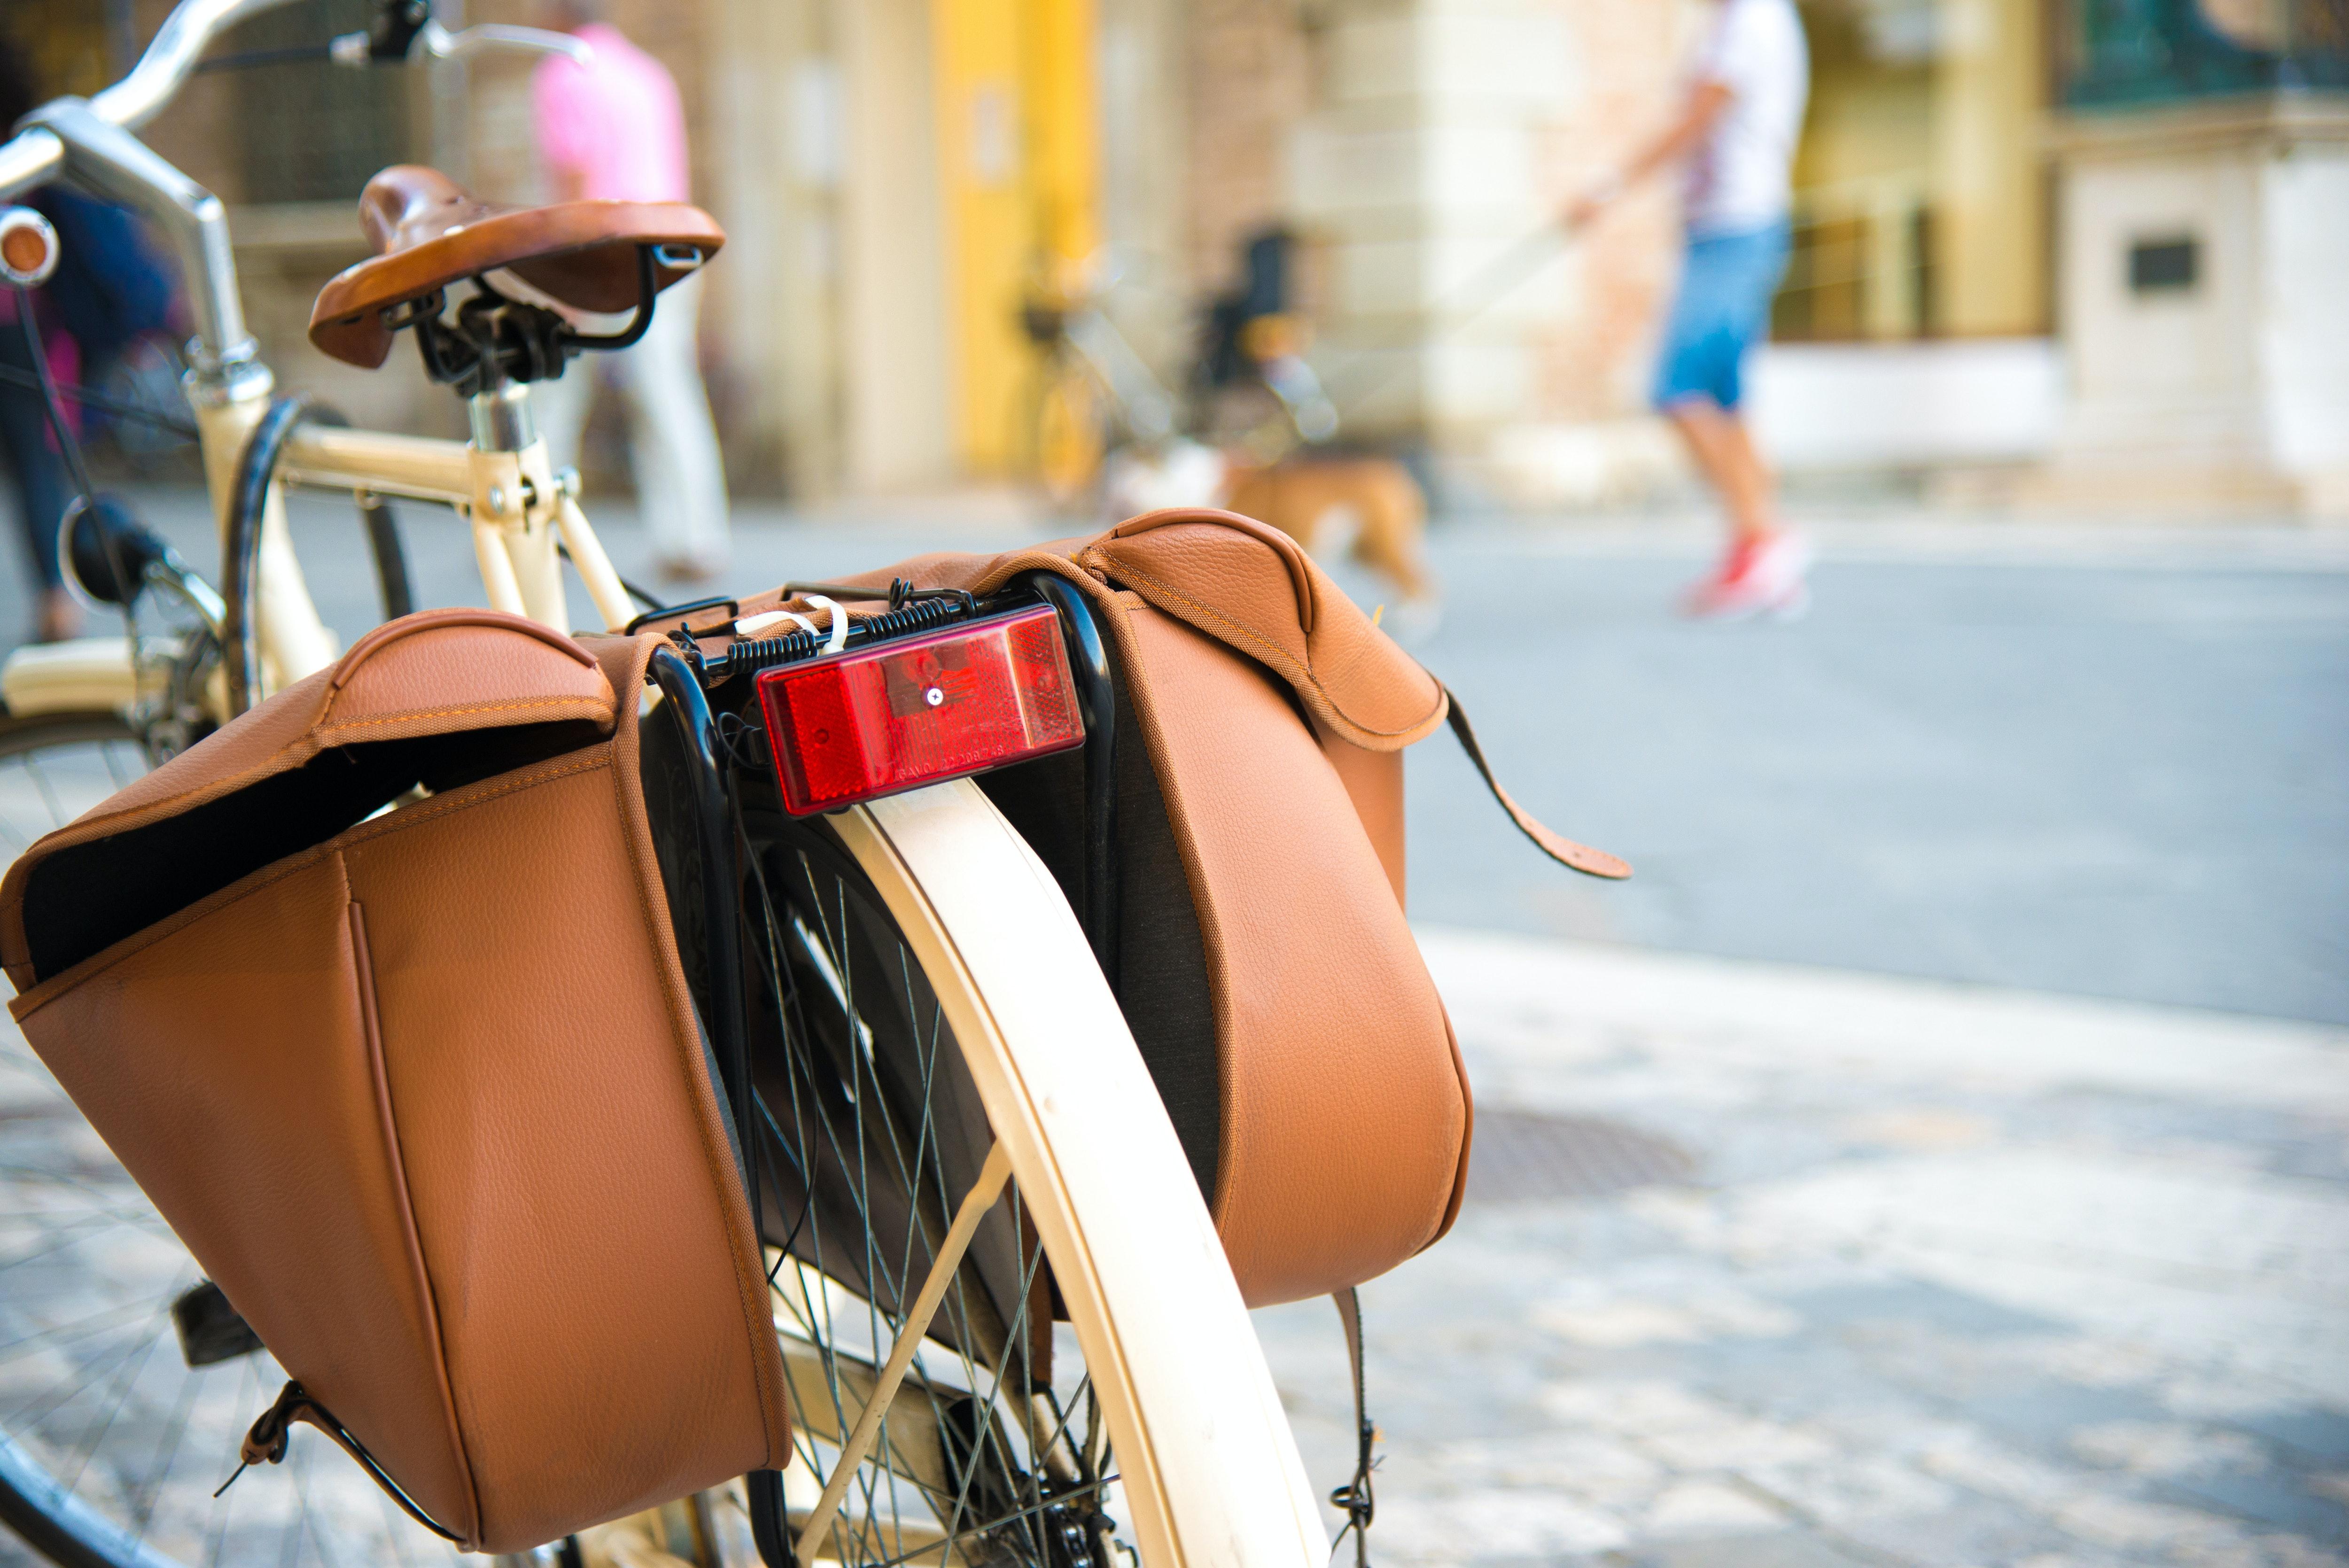 Waterproof Bicycle Tour Rear Panniers,Bike Touring Bags,Heavy Duty,Black,Large